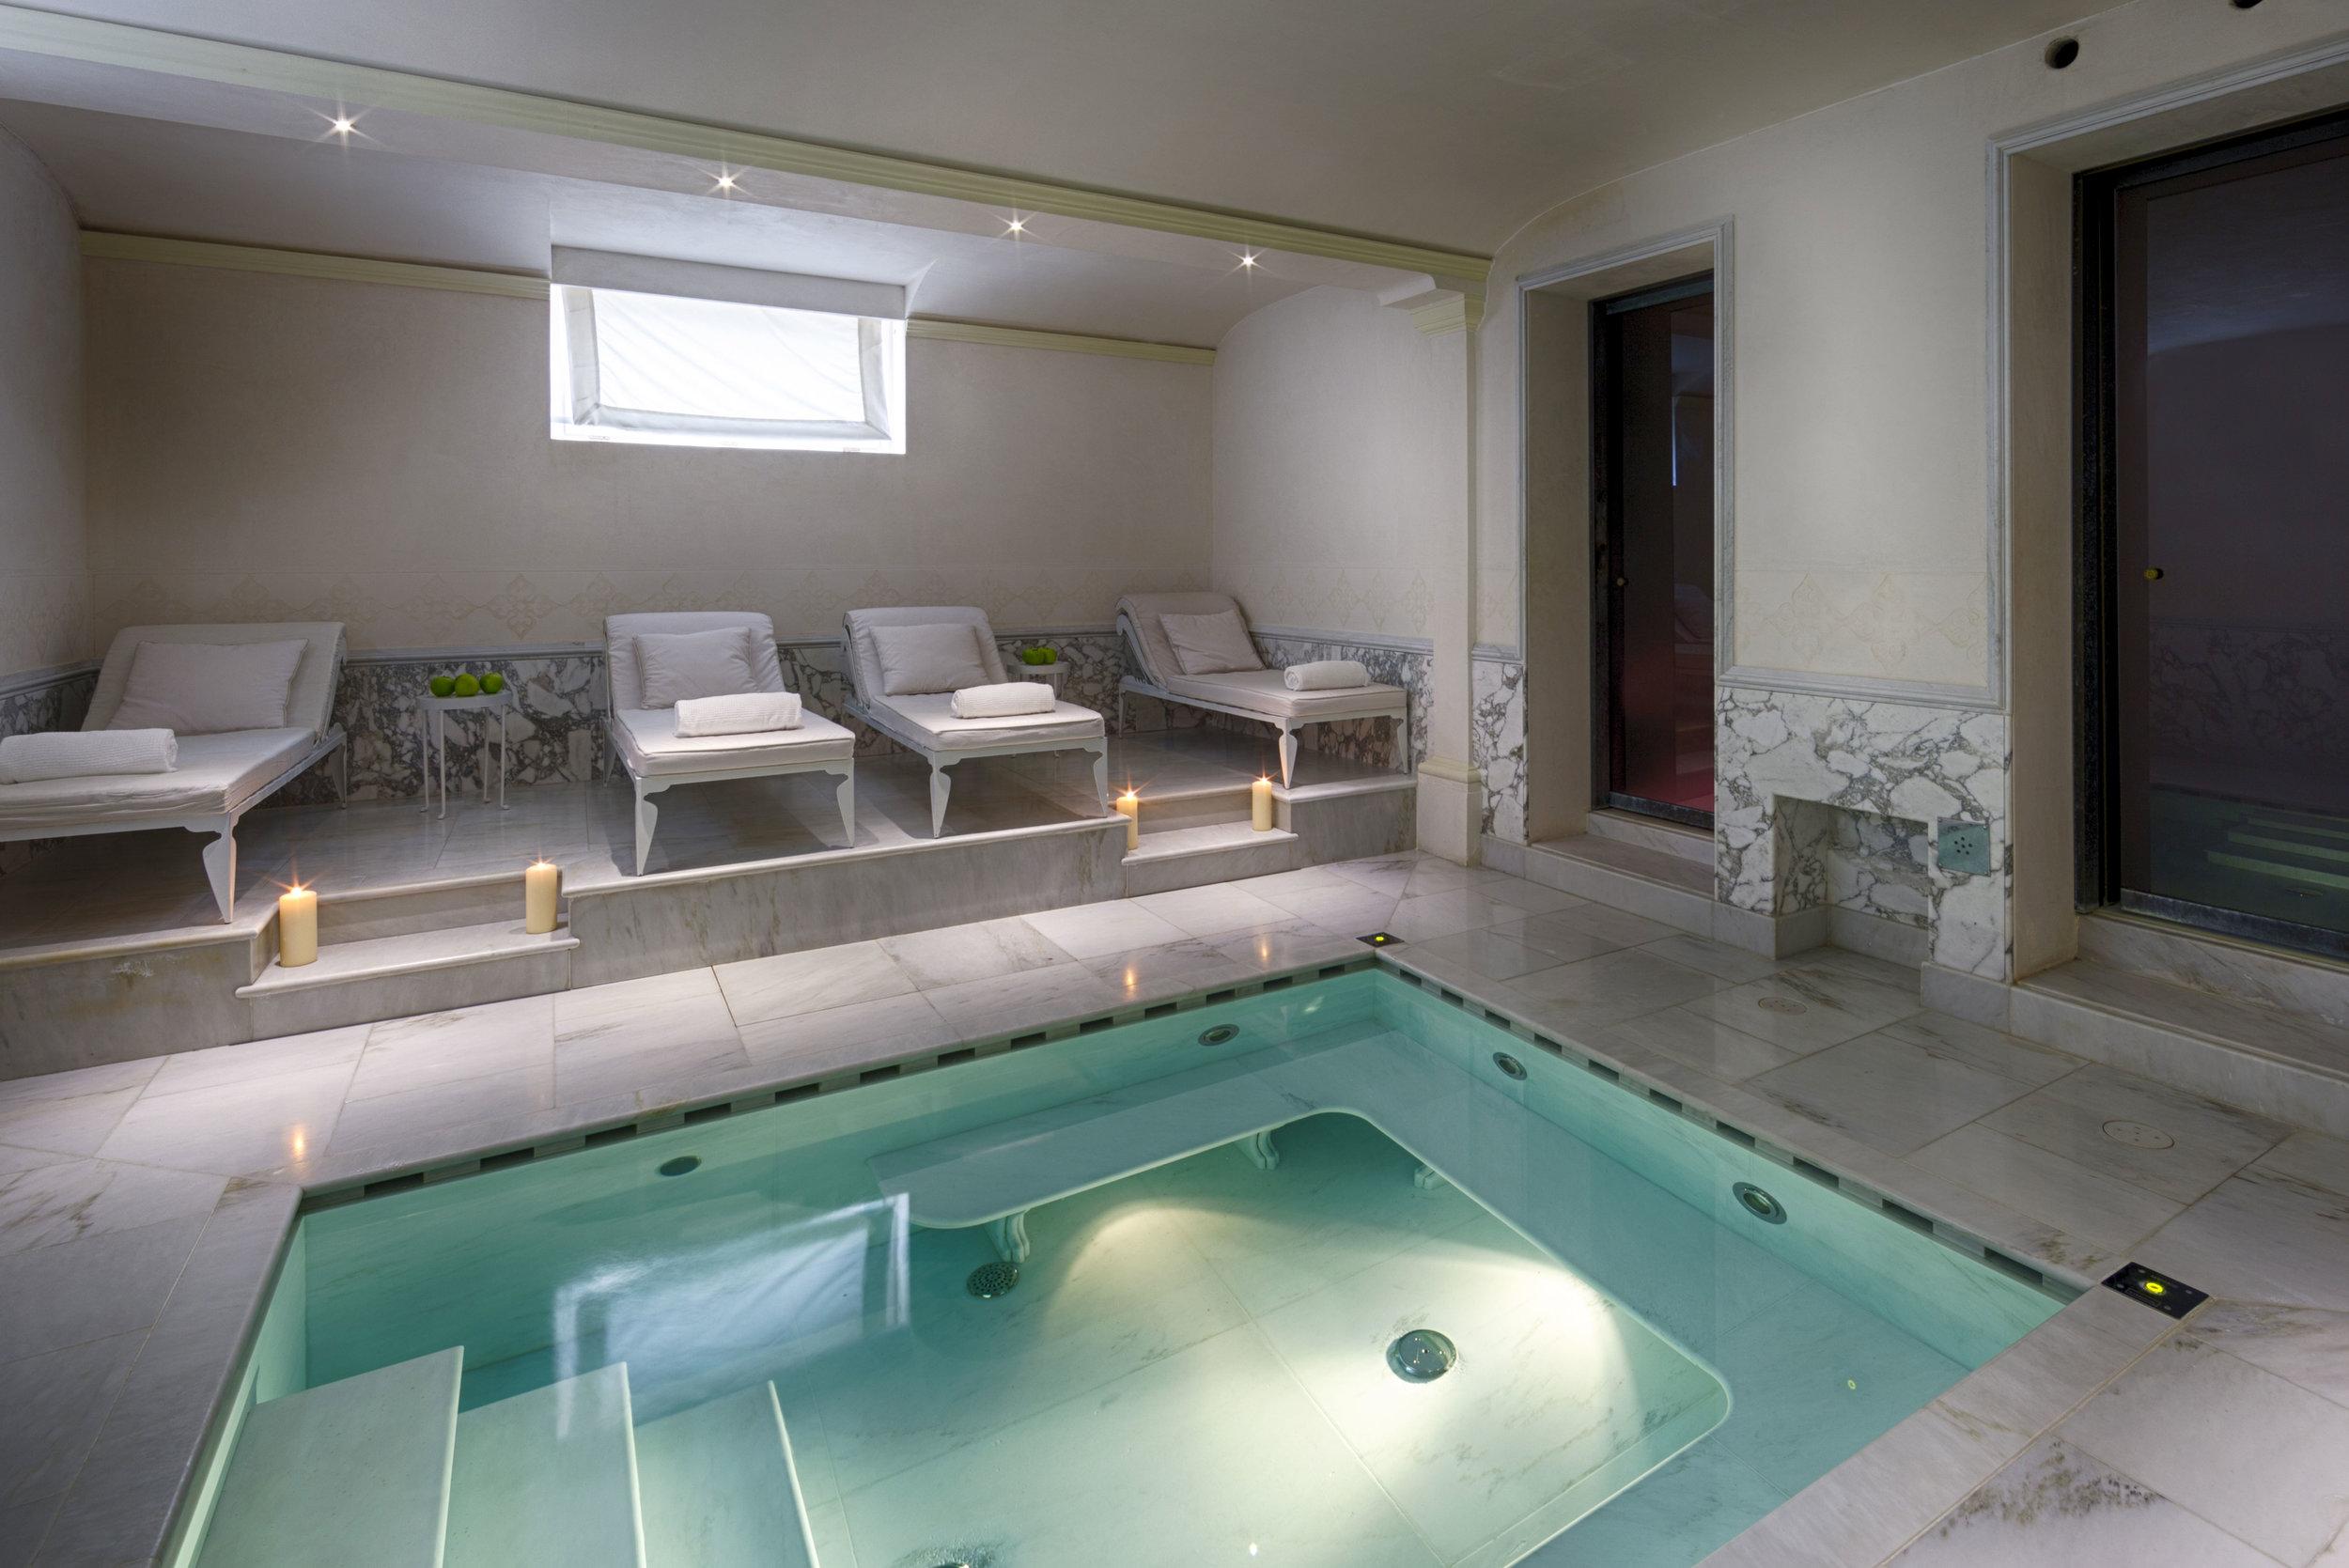 villa cora spa.jpg